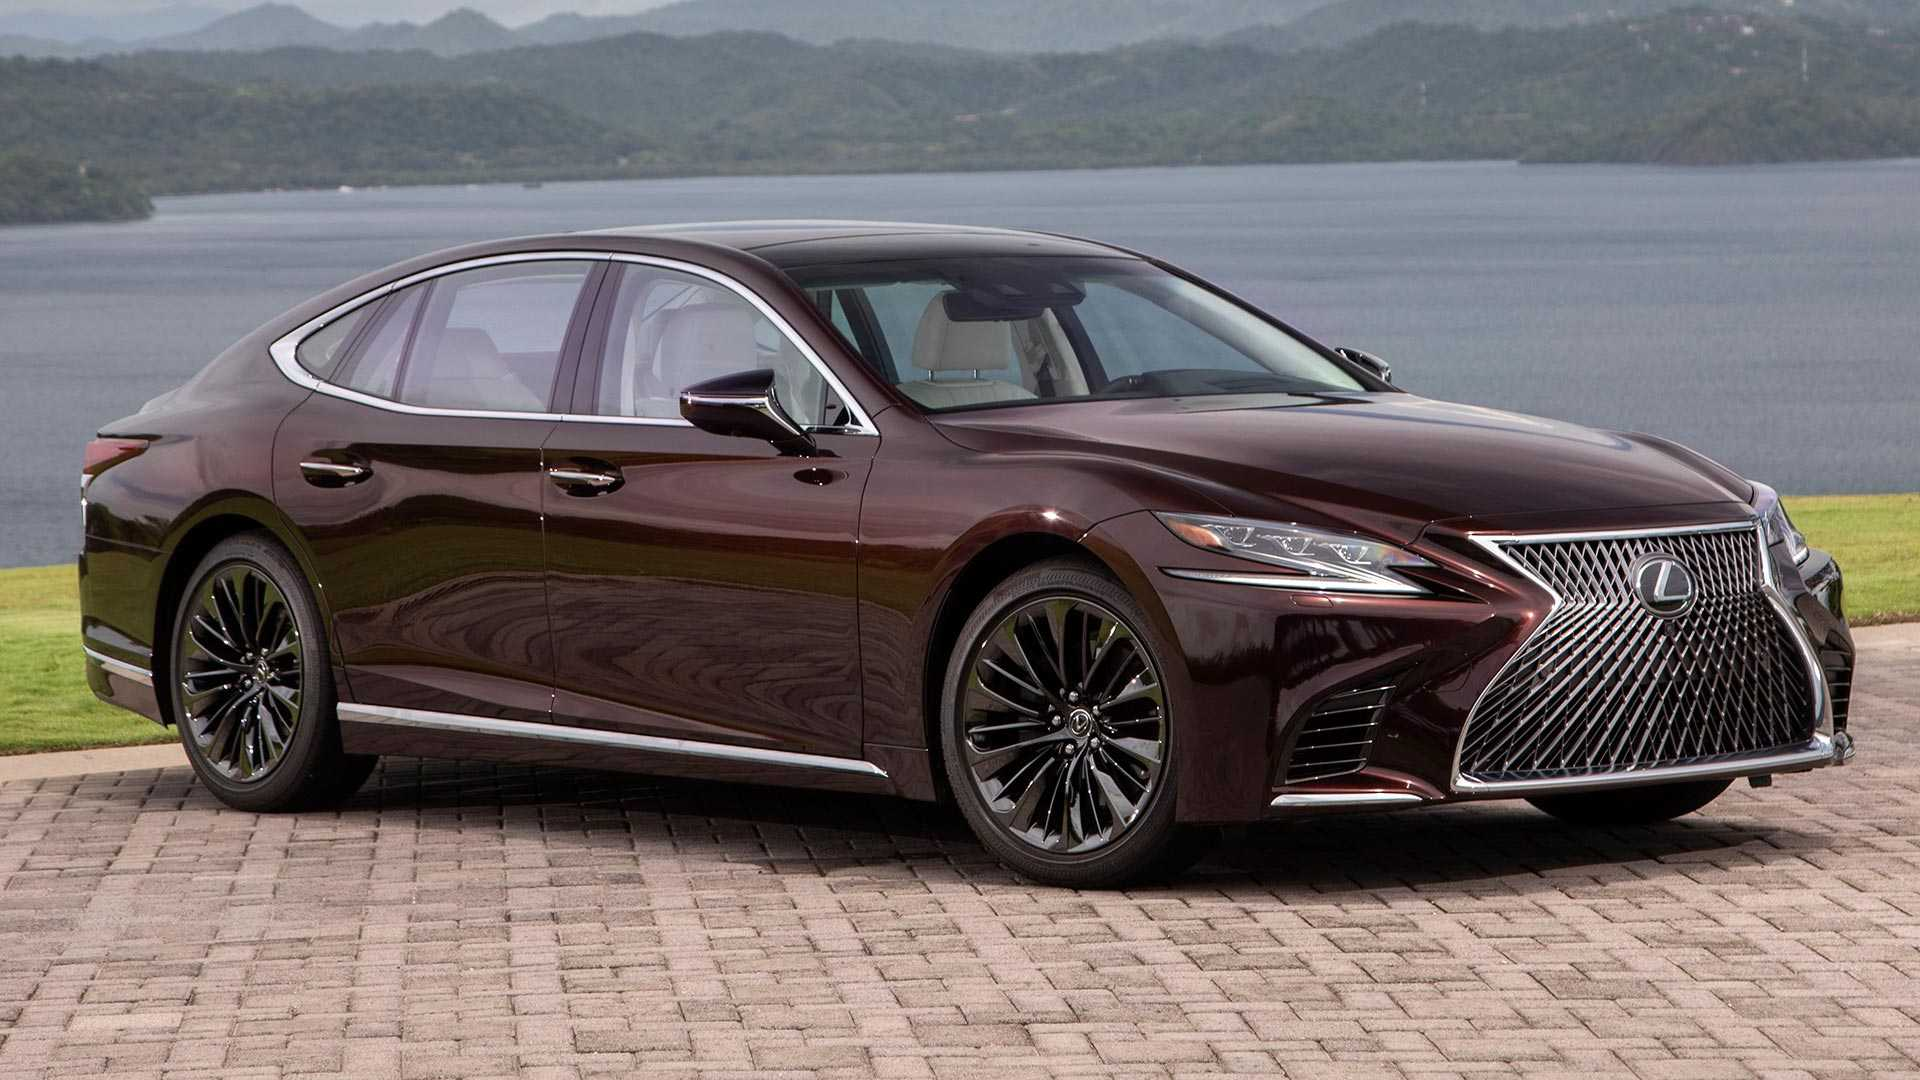 2020 Lexus Ls 500 Inspiration Series For Sale